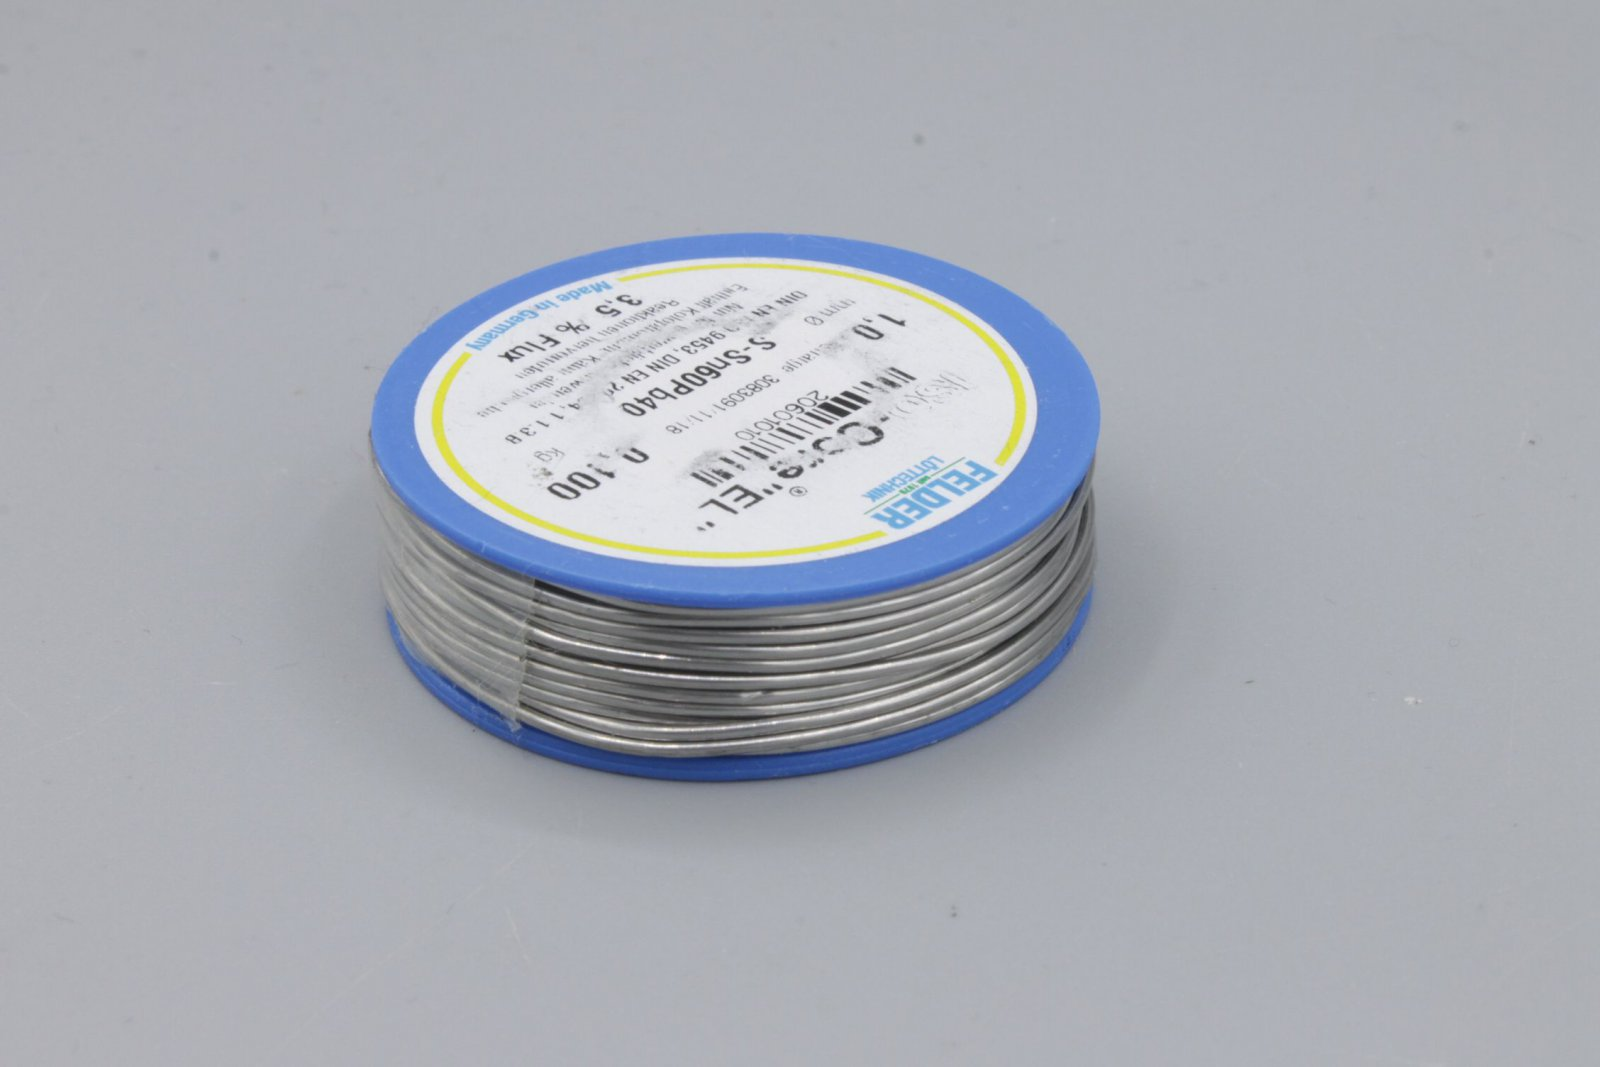 Lötzinn 1mm bleihaltig - L-SN60/40 mit 3,5% Flussmittel 100g Lötdraht Lötzinn